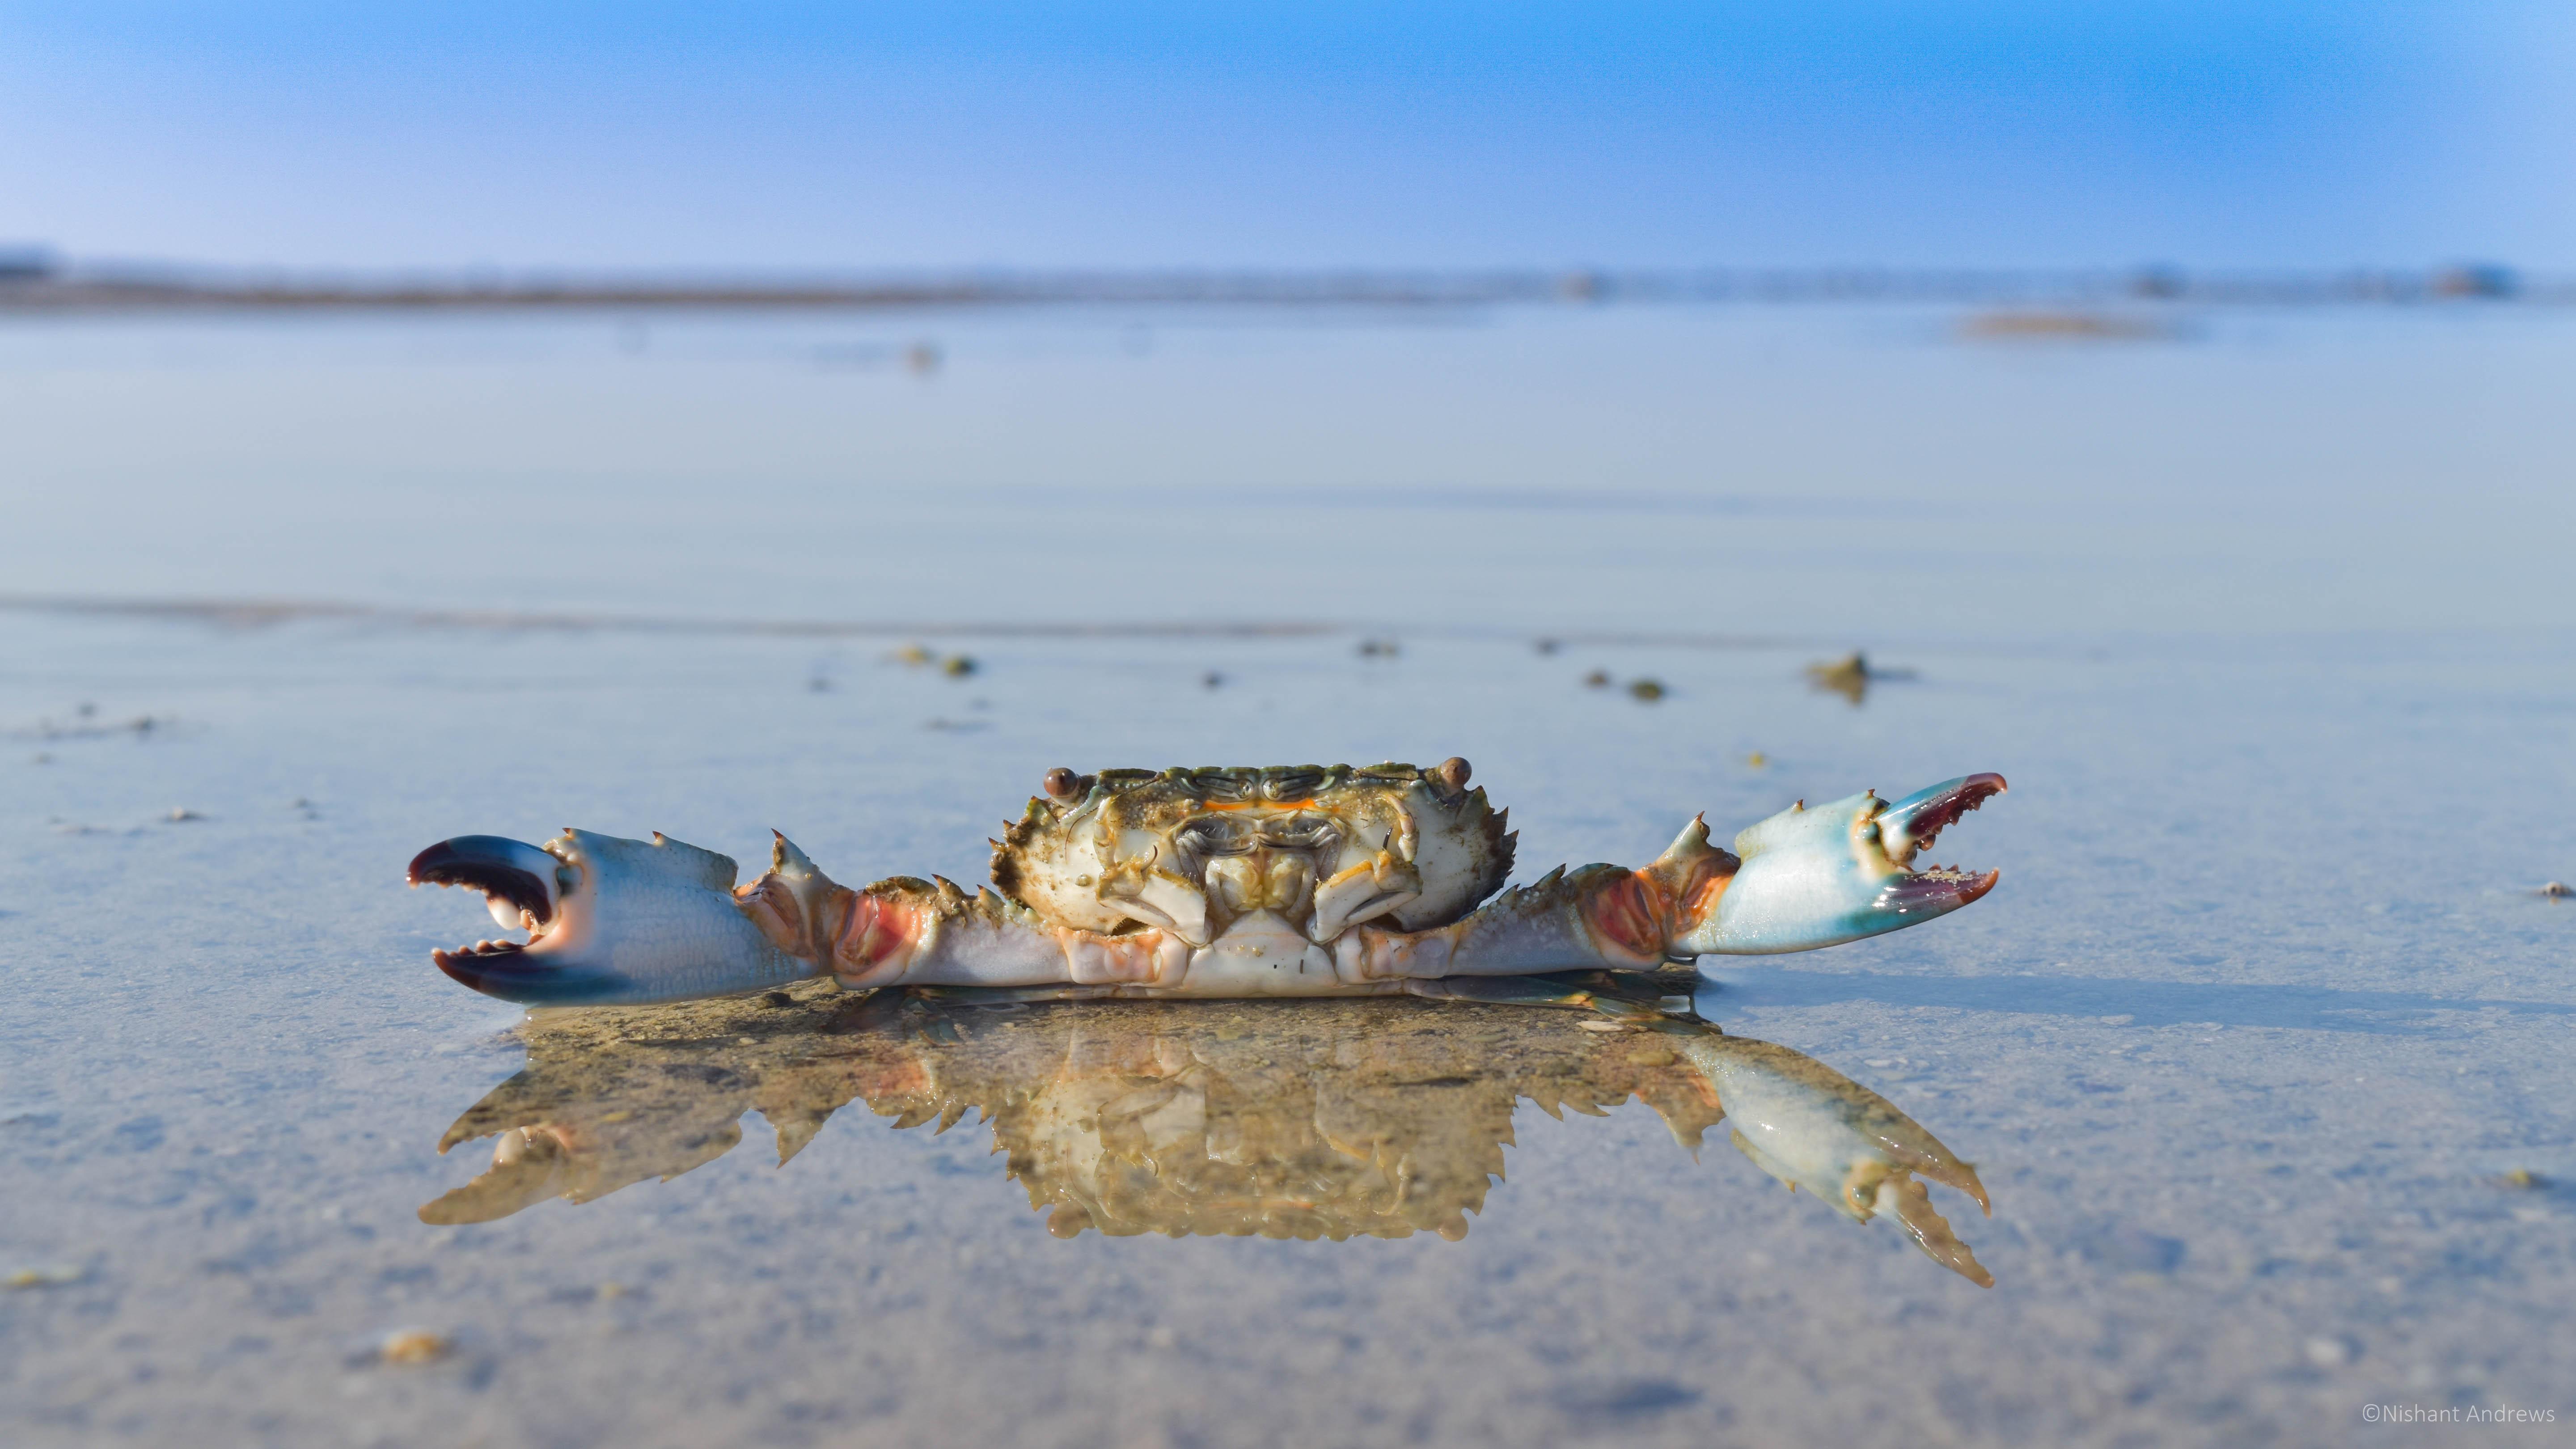 Neptune crab at Marine National Park